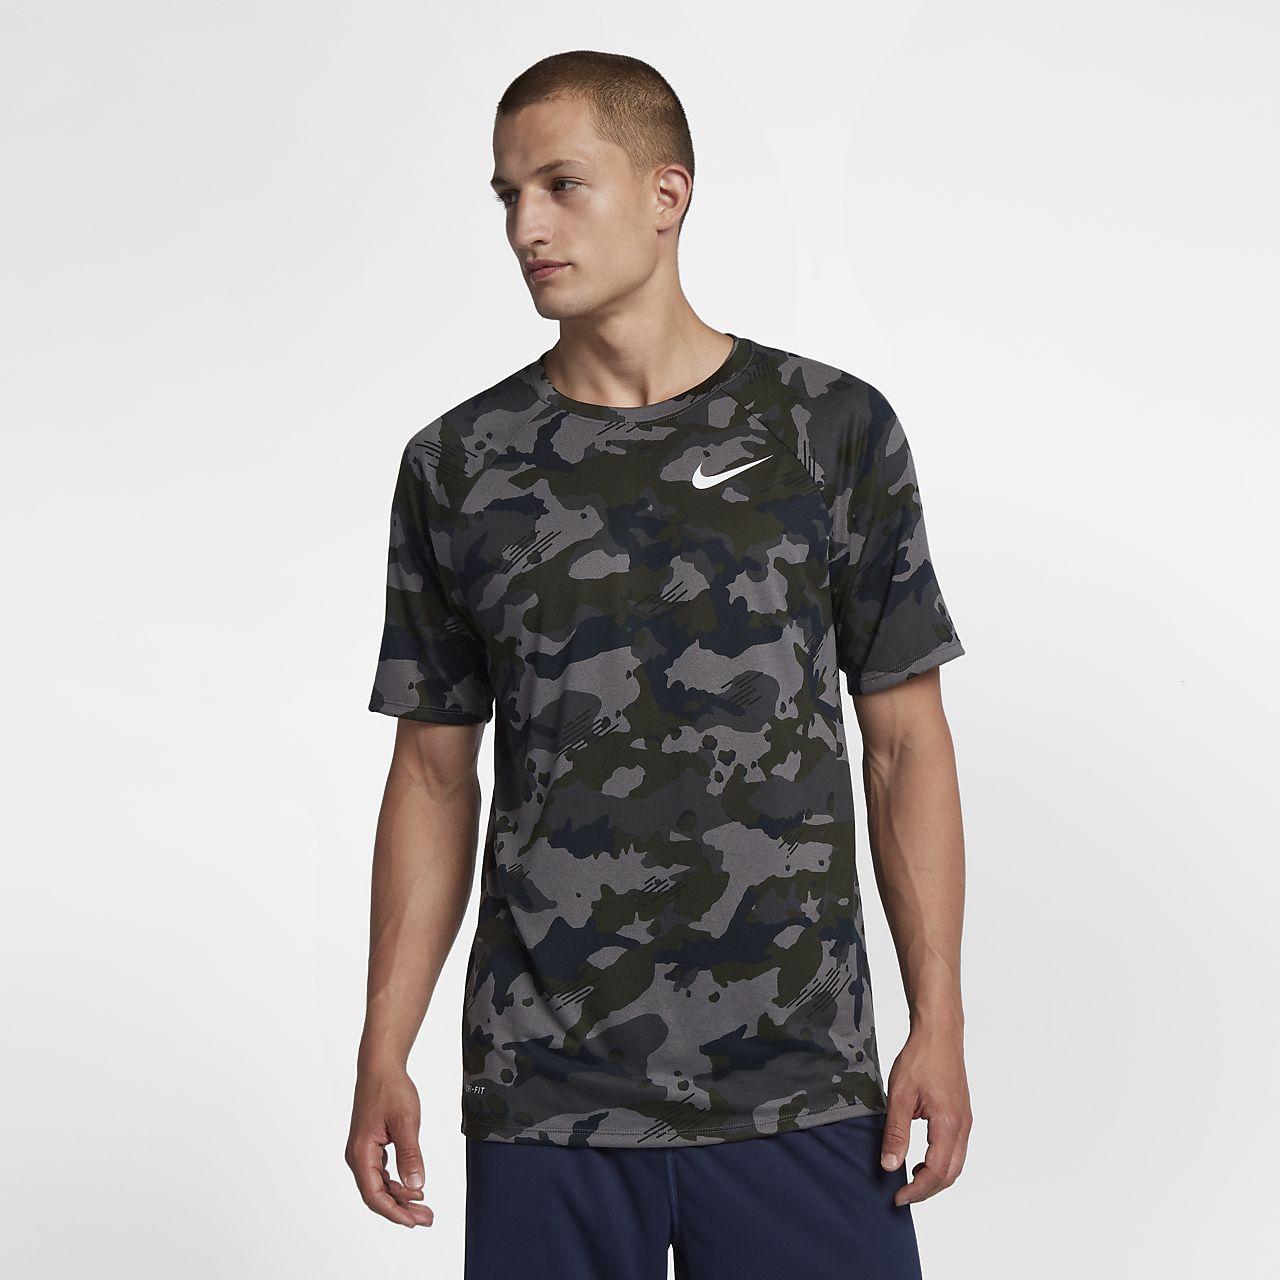 423d81dee54b Nike Dri-FIT Men s Training T-Shirt. Nike.com AE